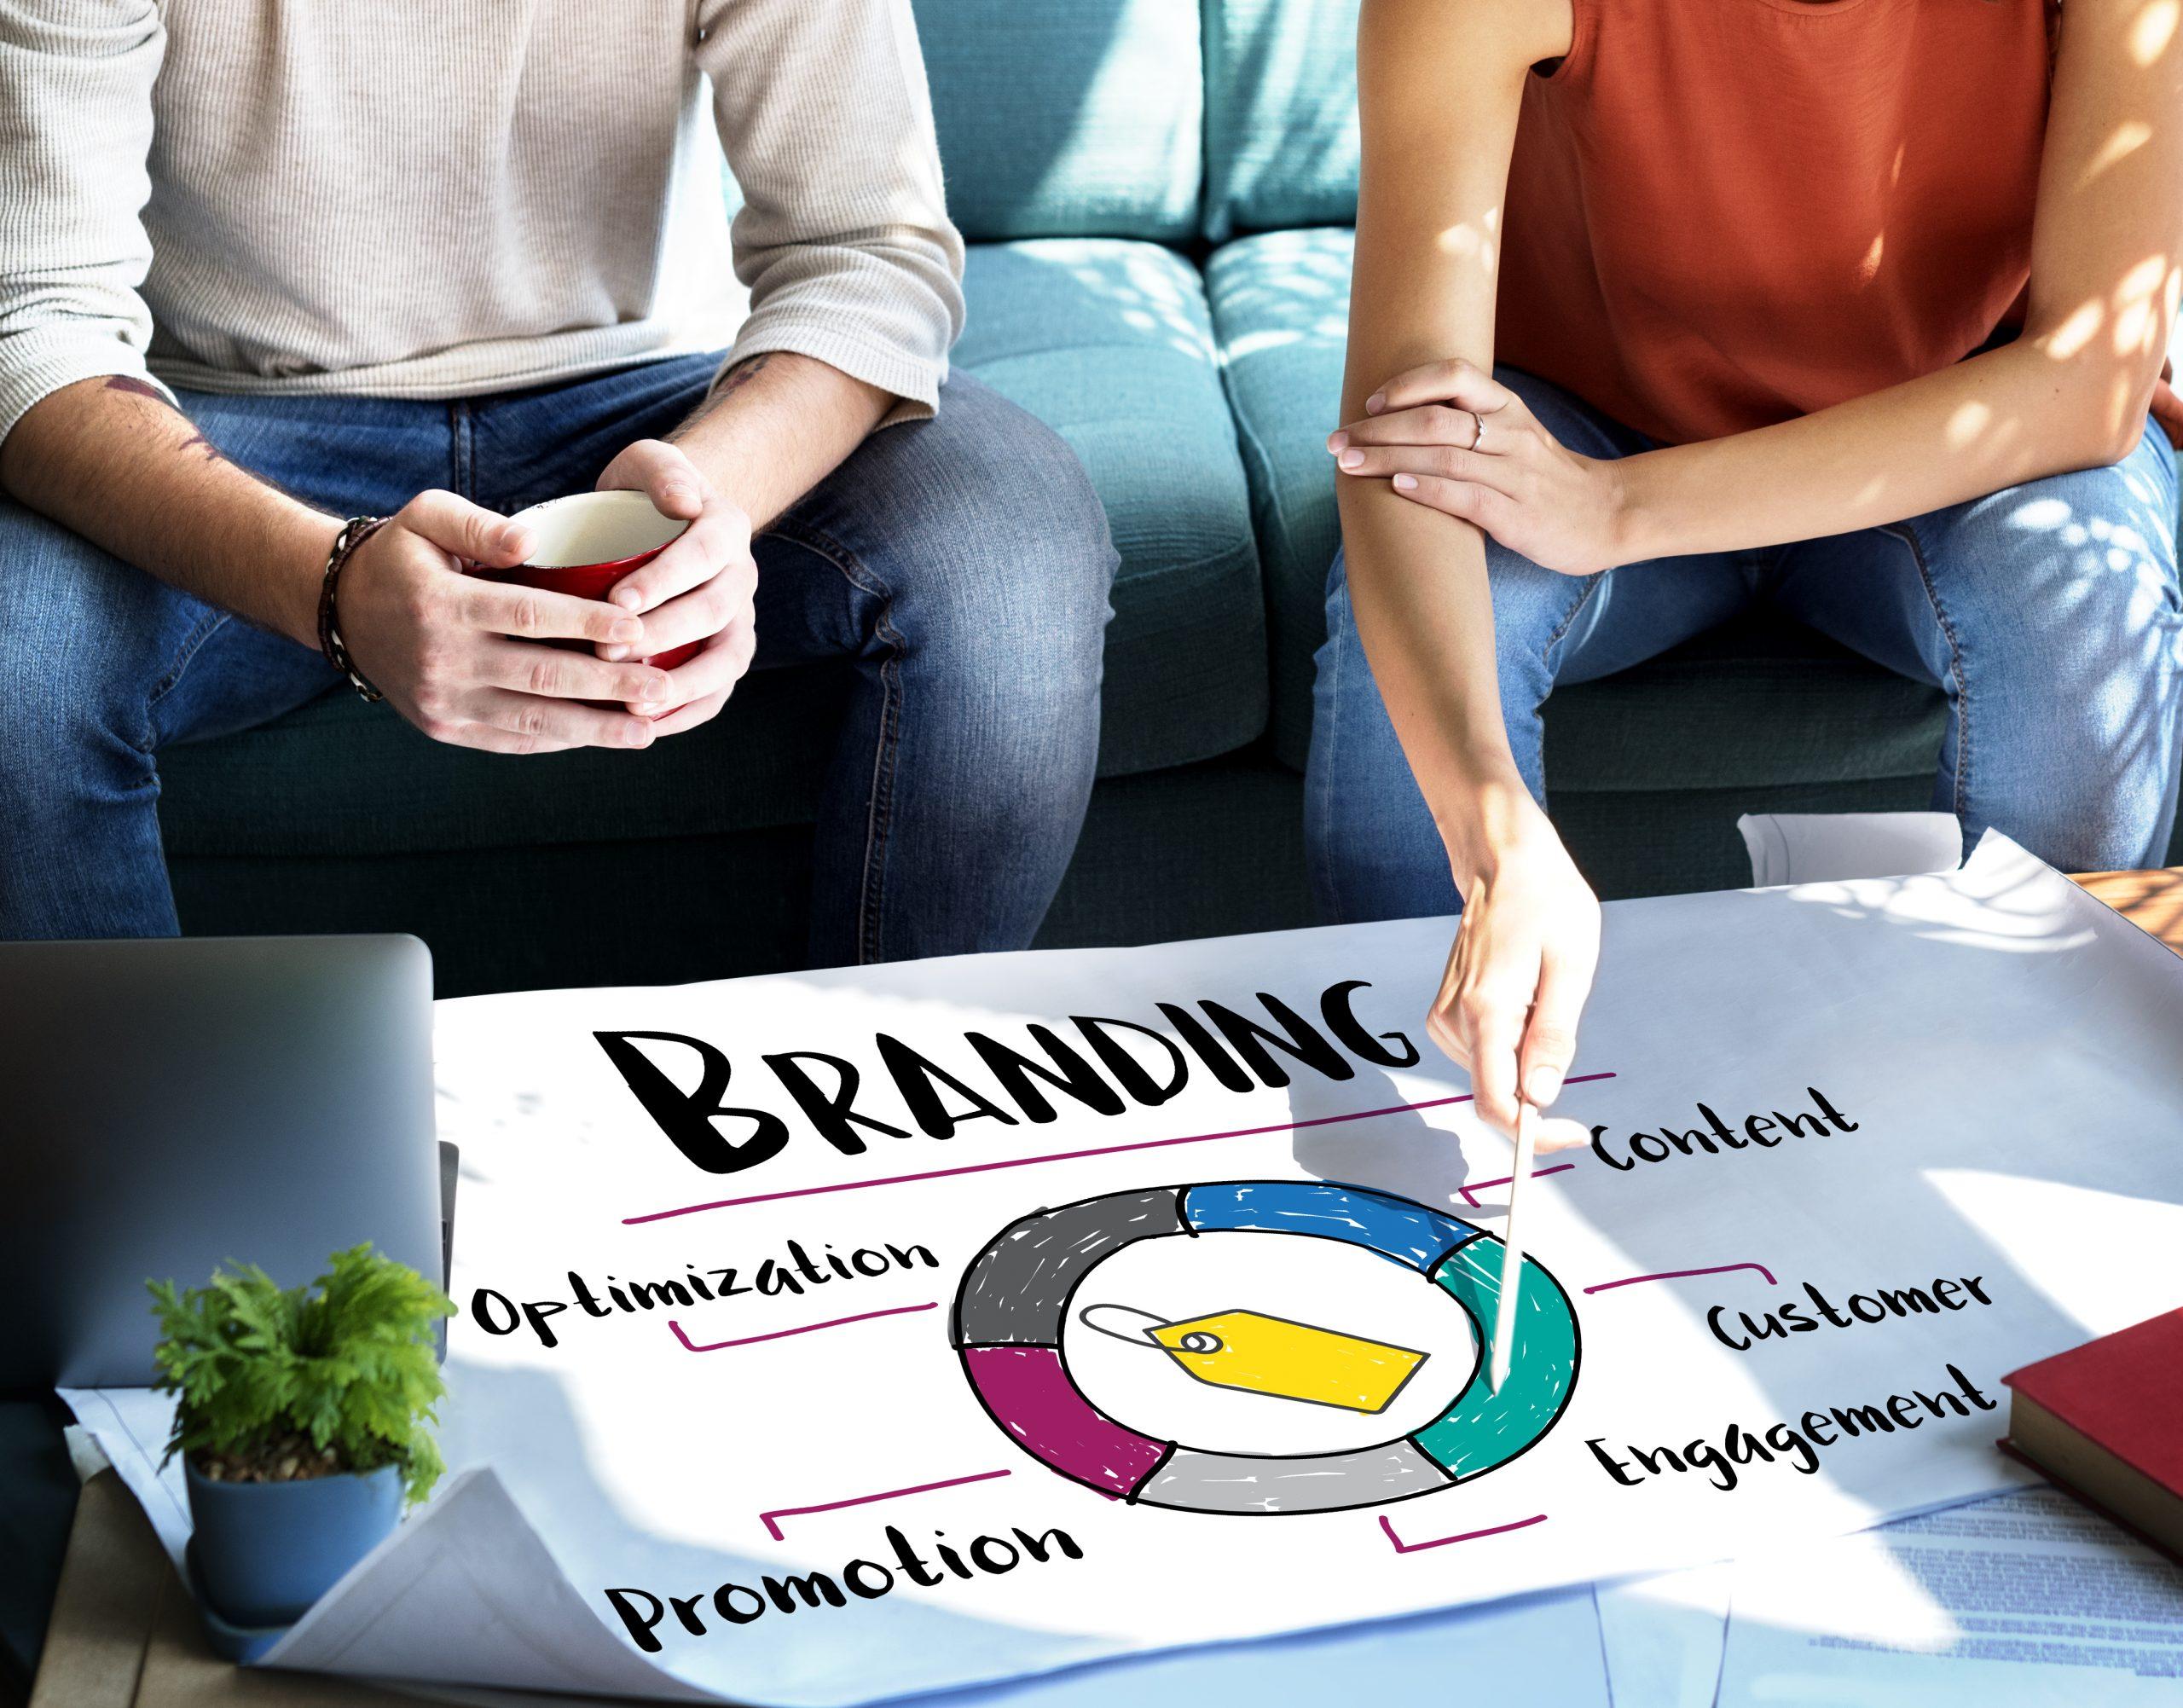 Social Network Branding: Tips and Advice on Design